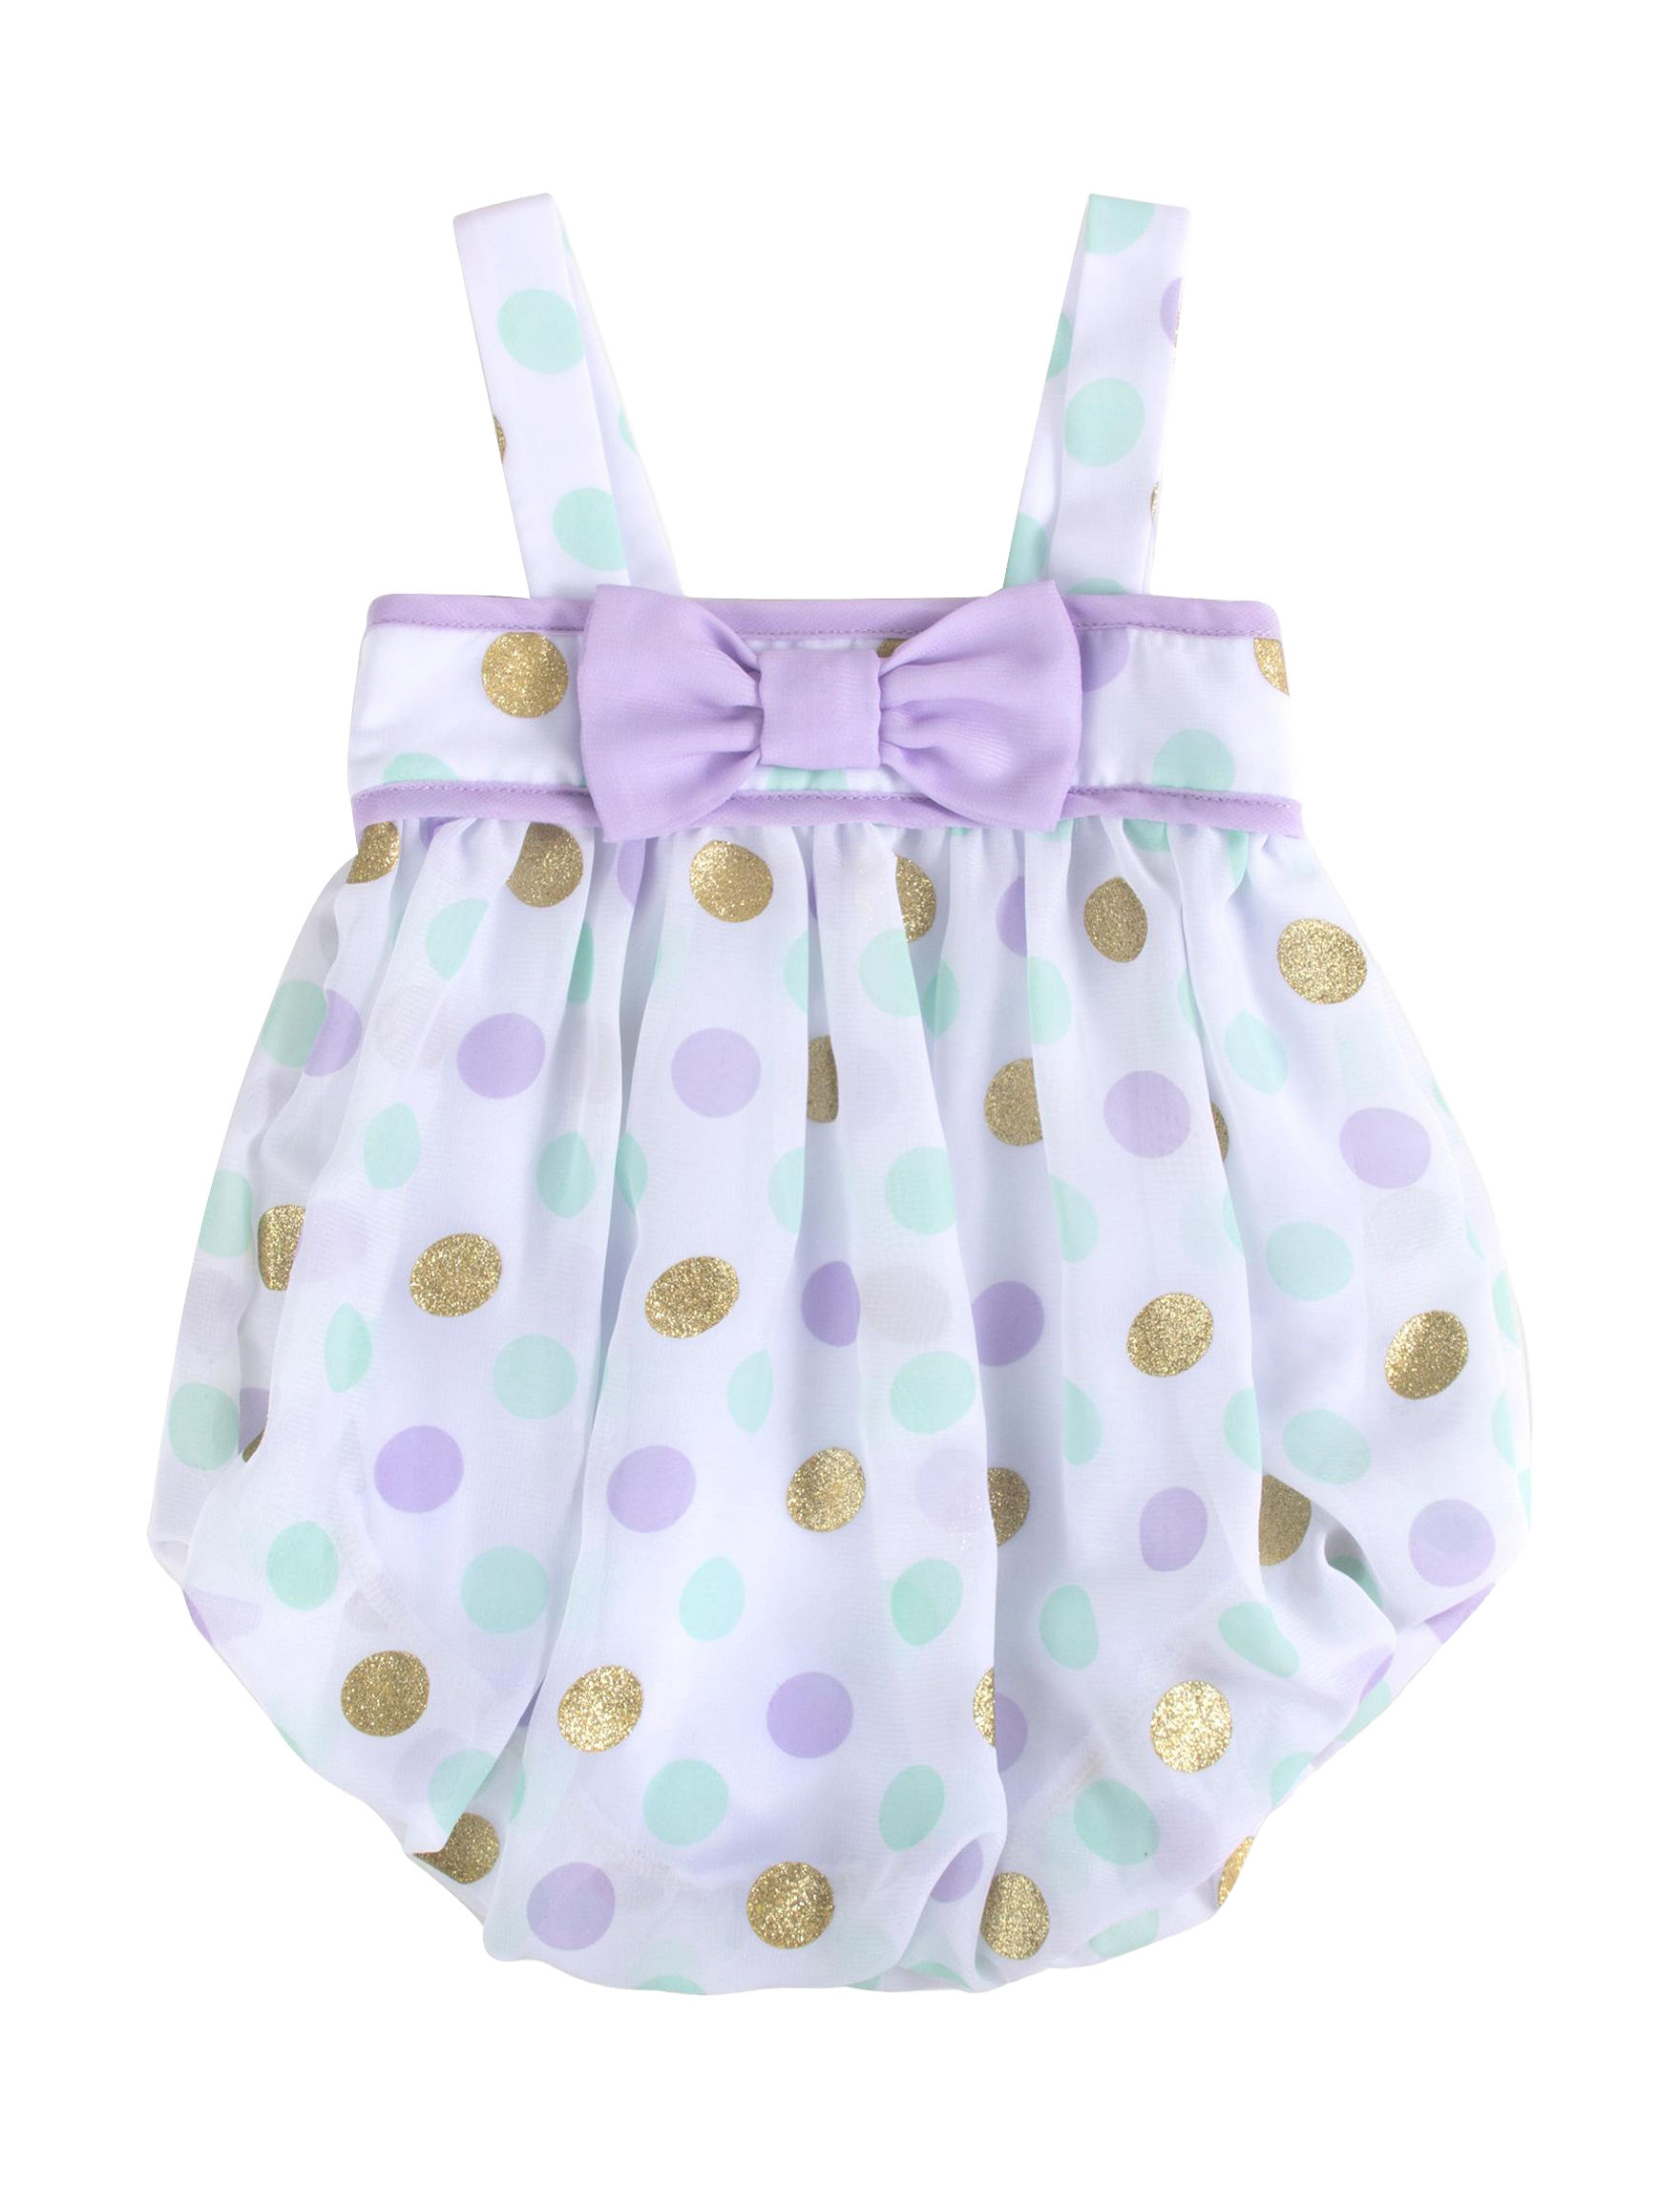 Baby Essentials Lilac